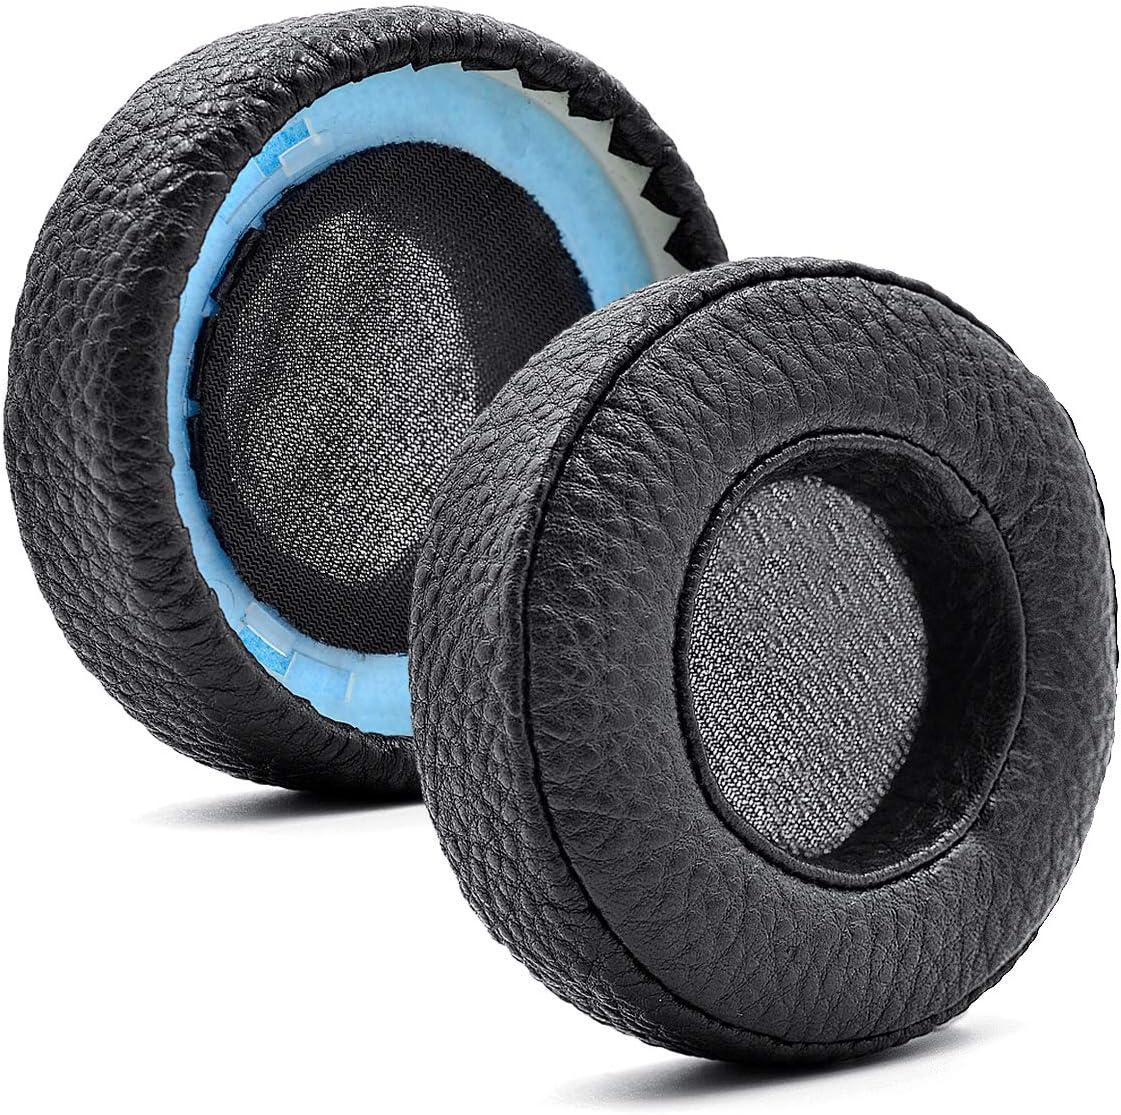 Almohadillas para auriculares Monster Beats PRO/Detox negra